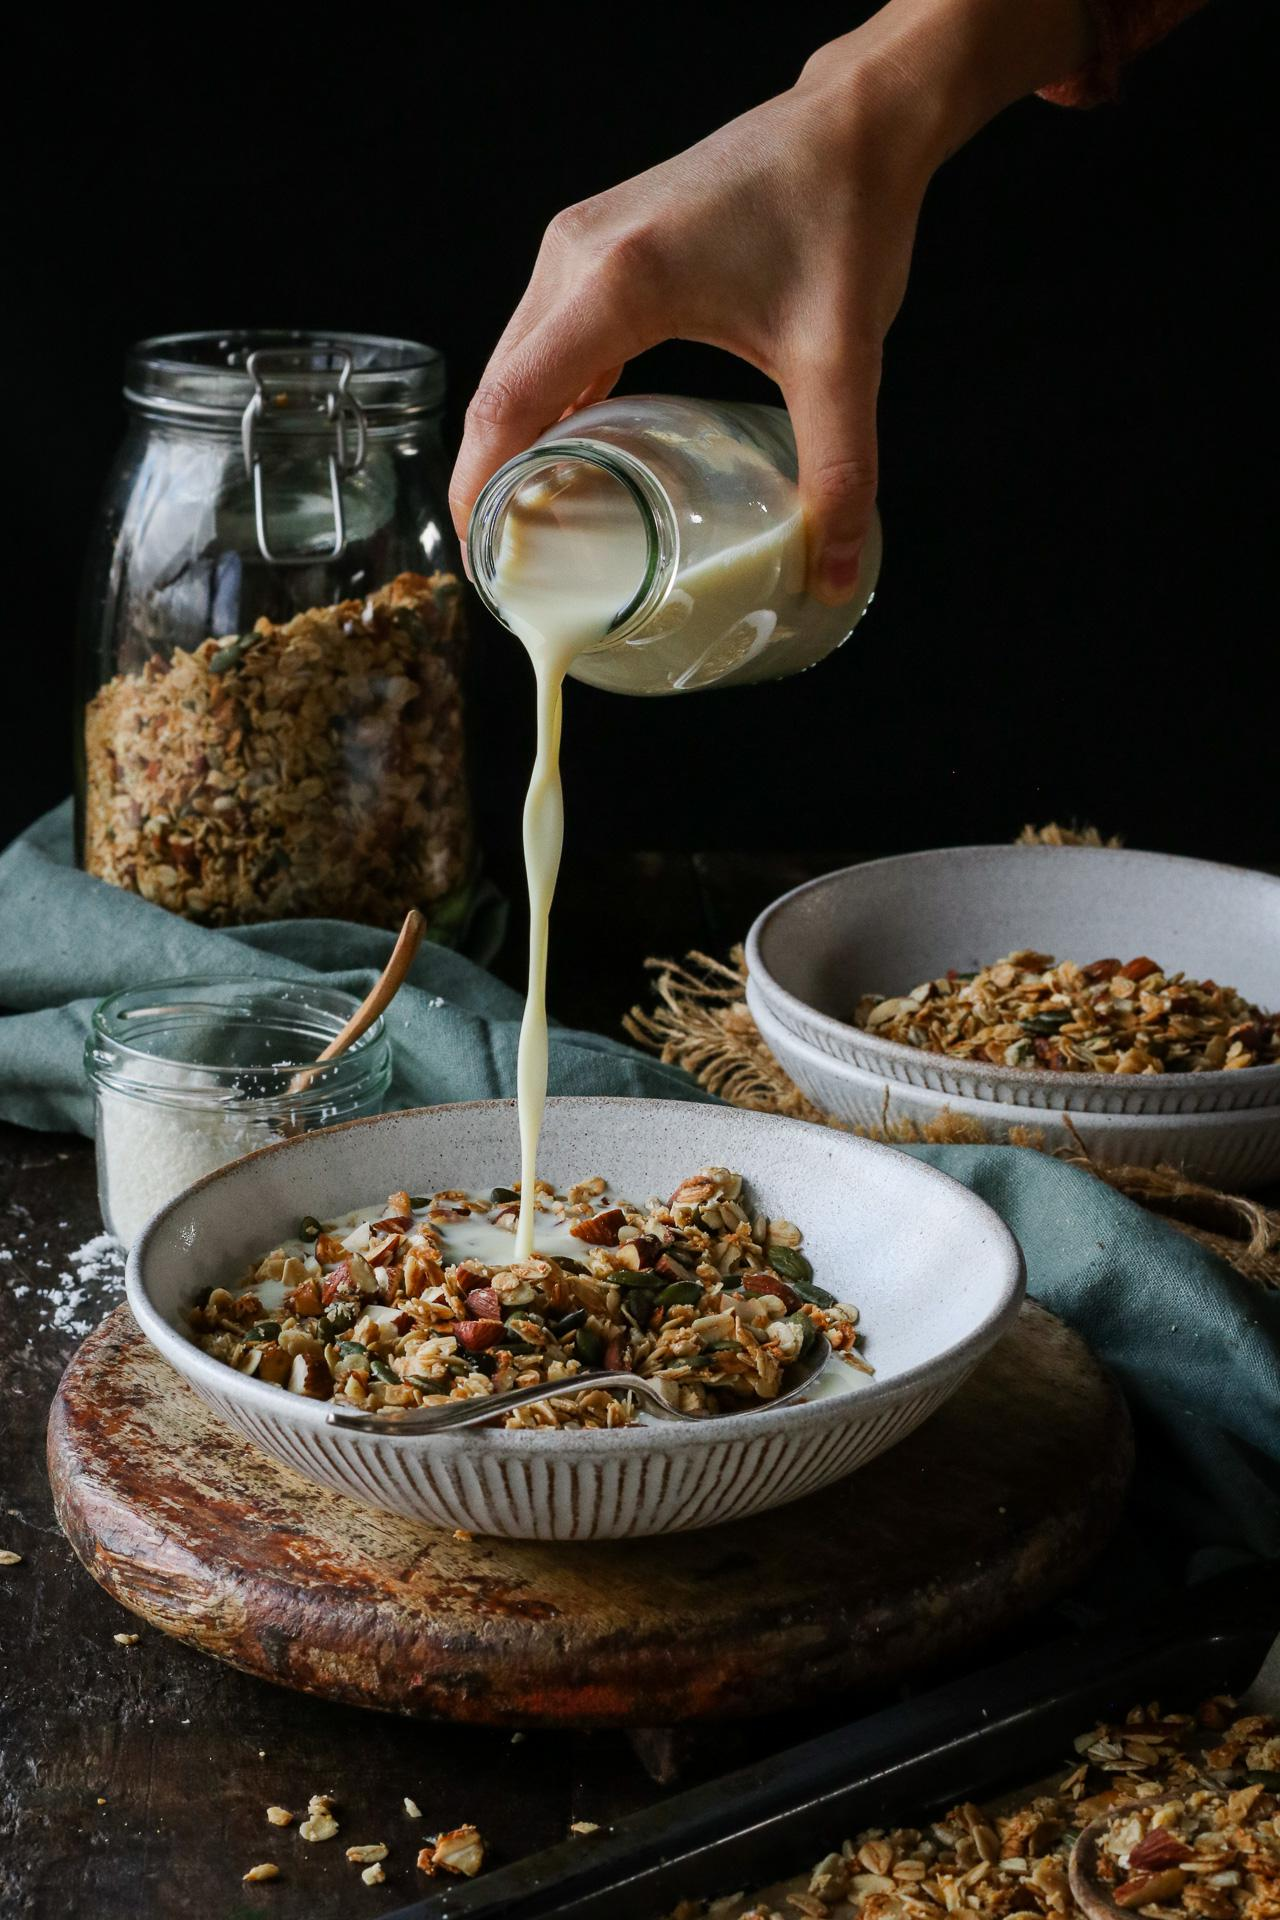 Main image of Toasted Coconut & Almond Granola